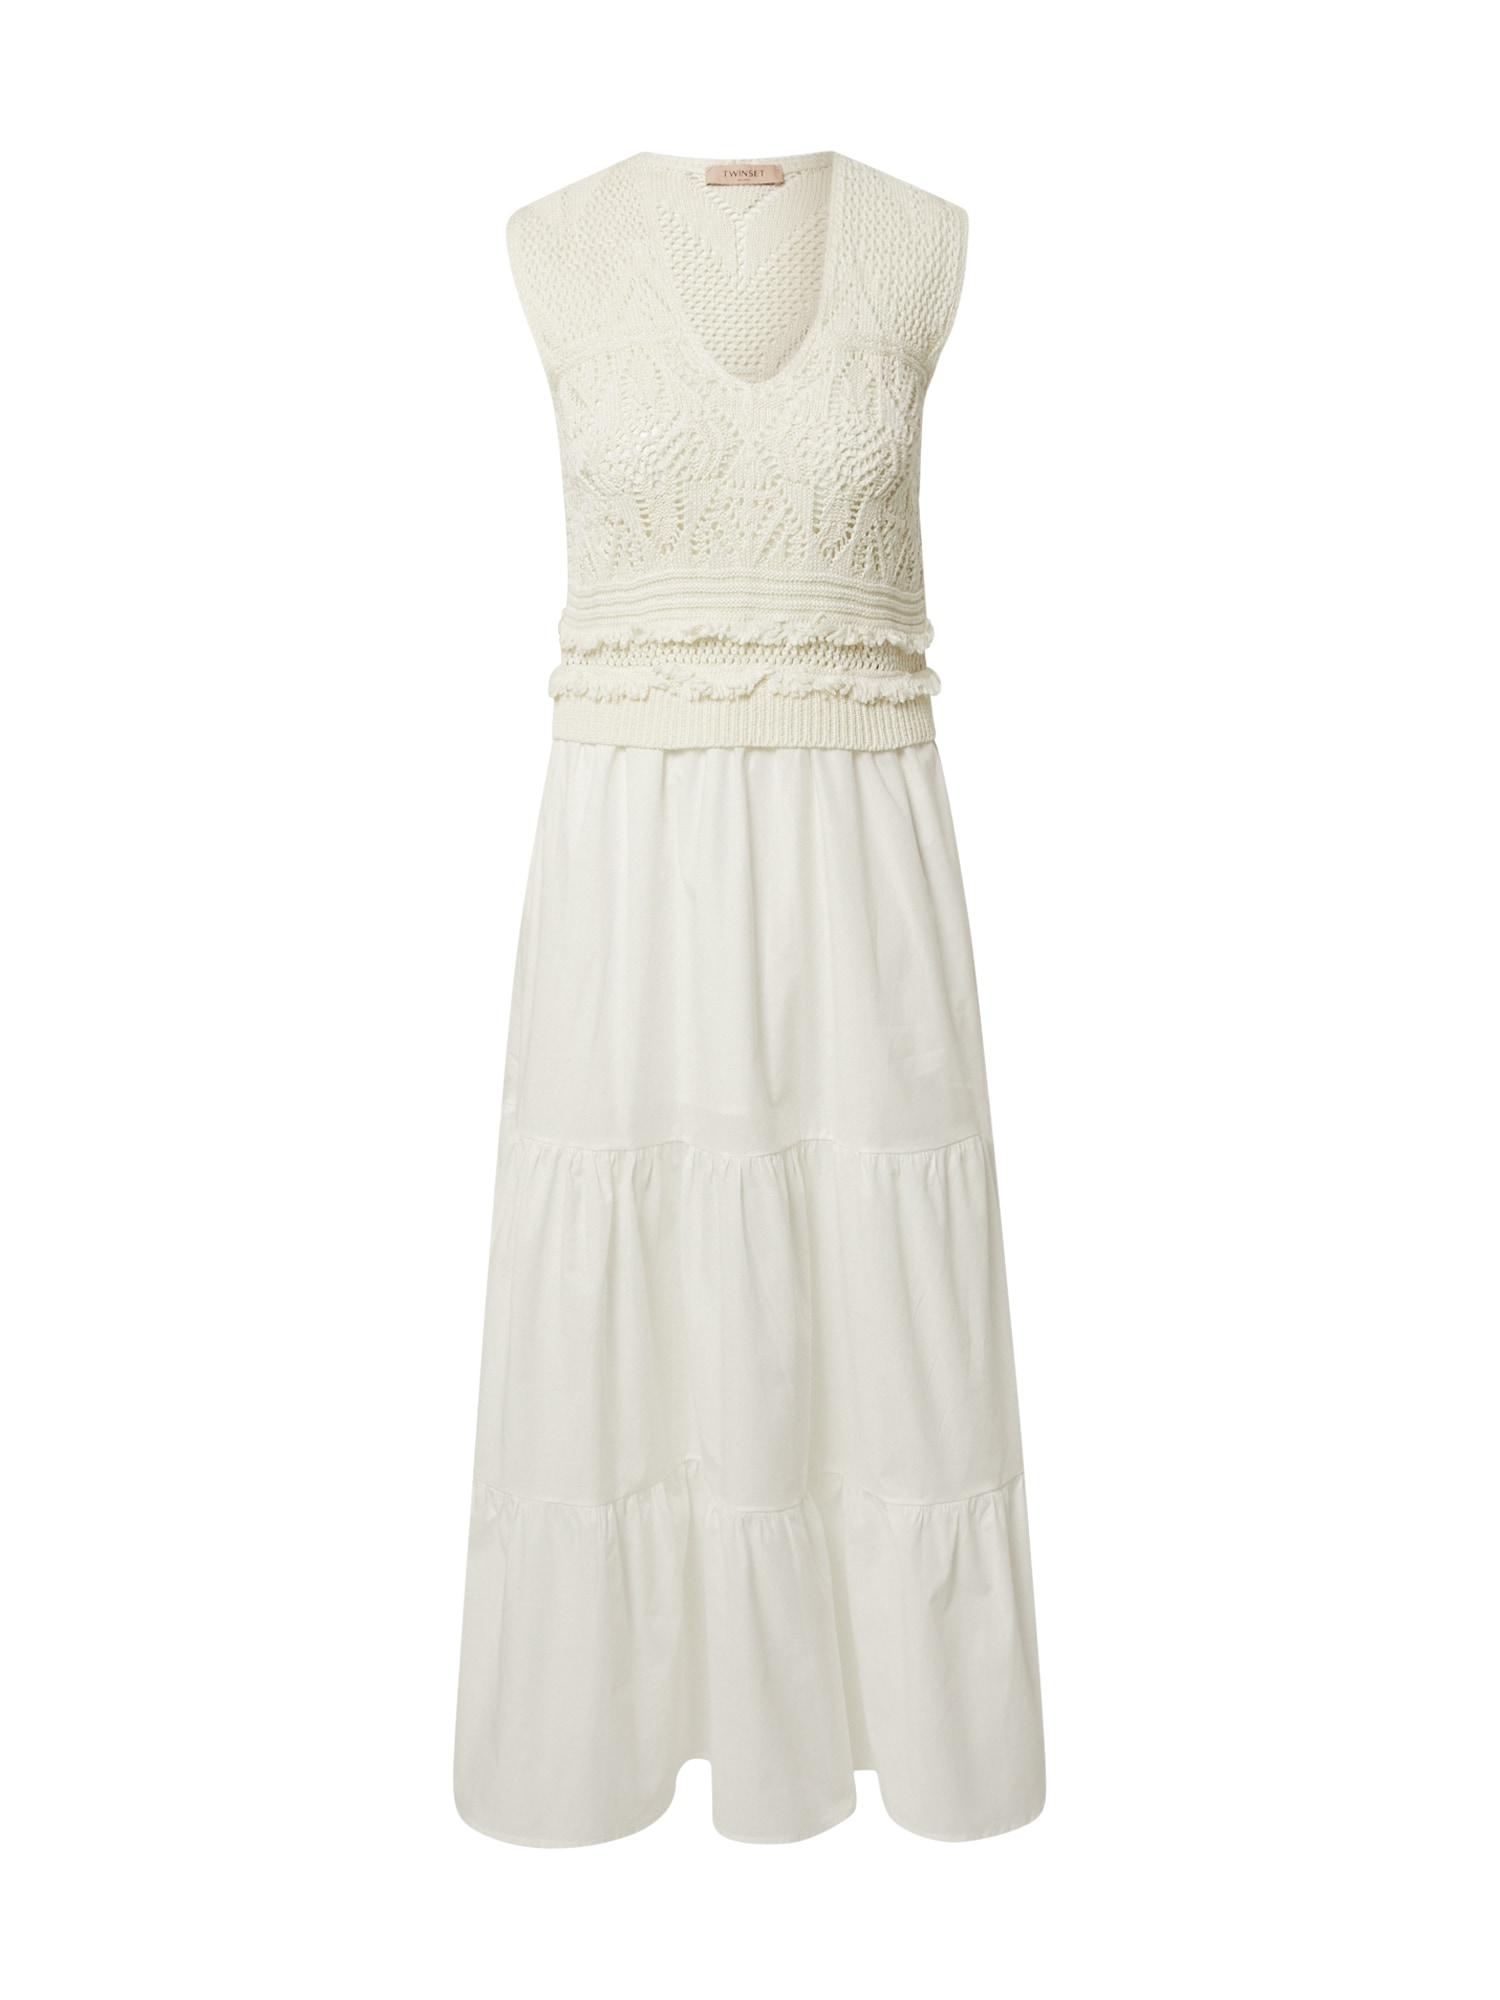 Twinset Suknelė balta